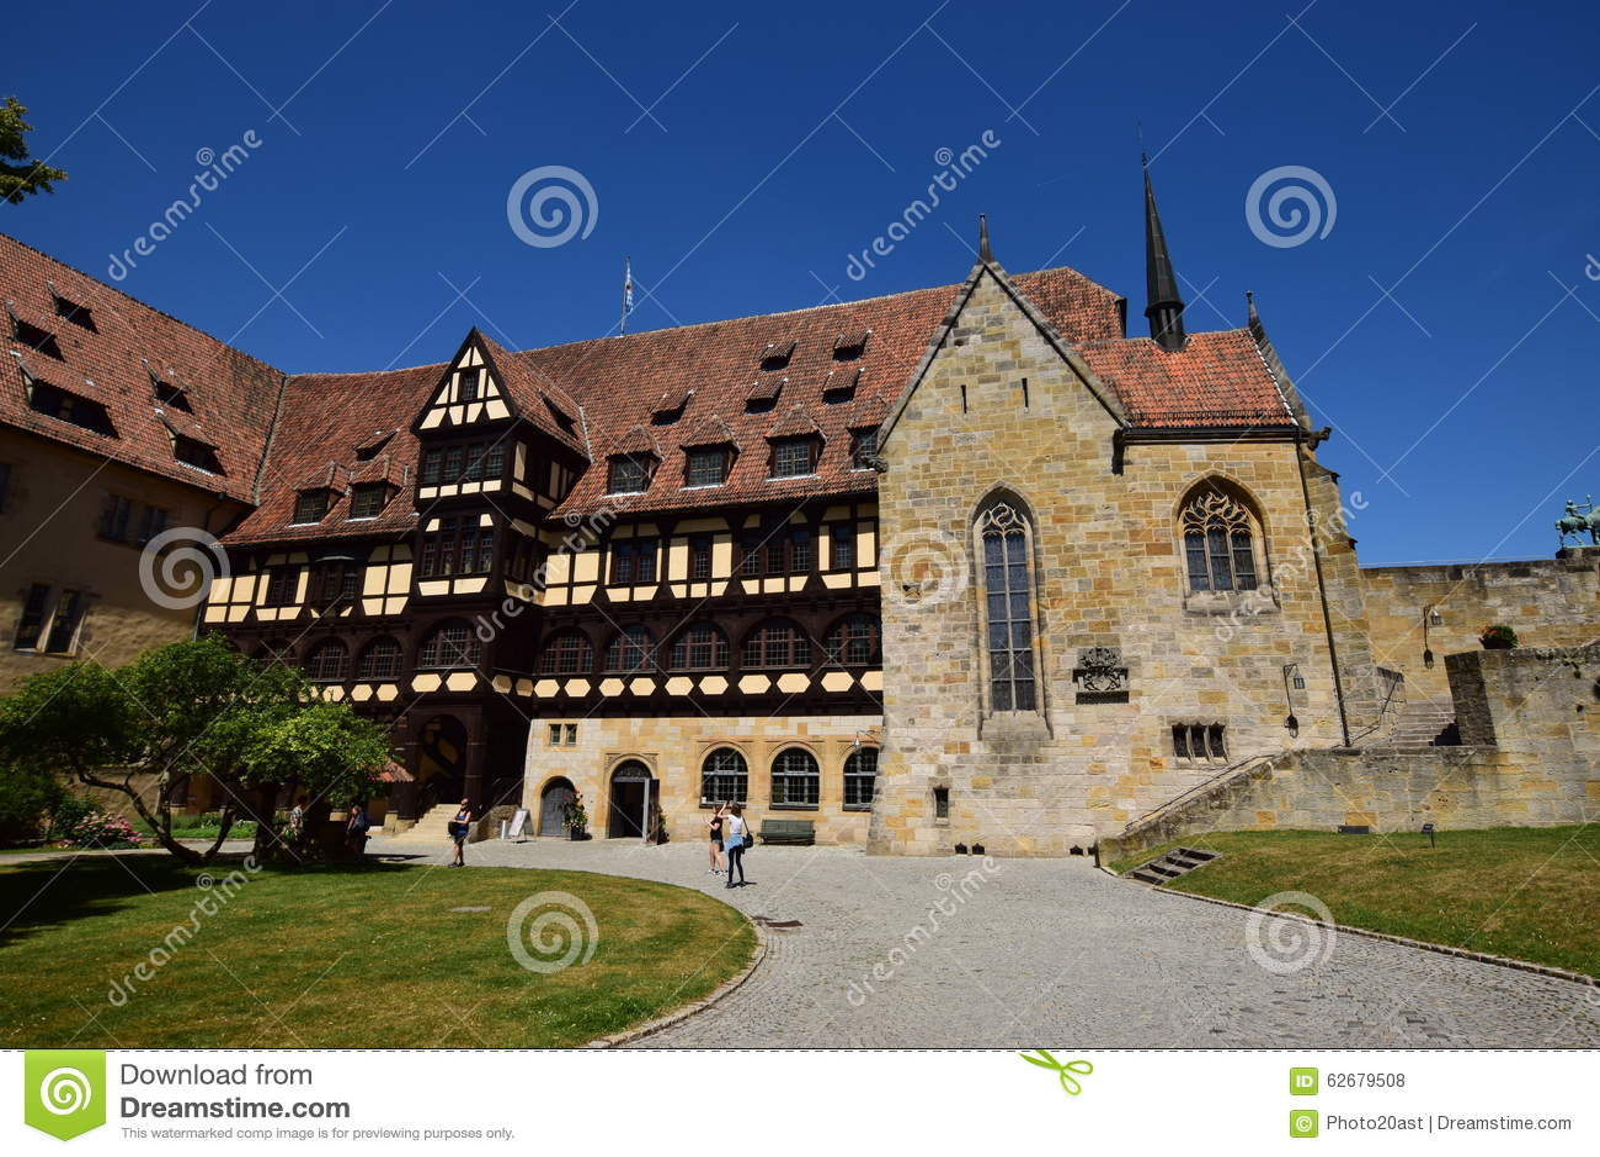 Historyczny budynek na VESTE COBURG kasztelu w Coburg, Niemcy